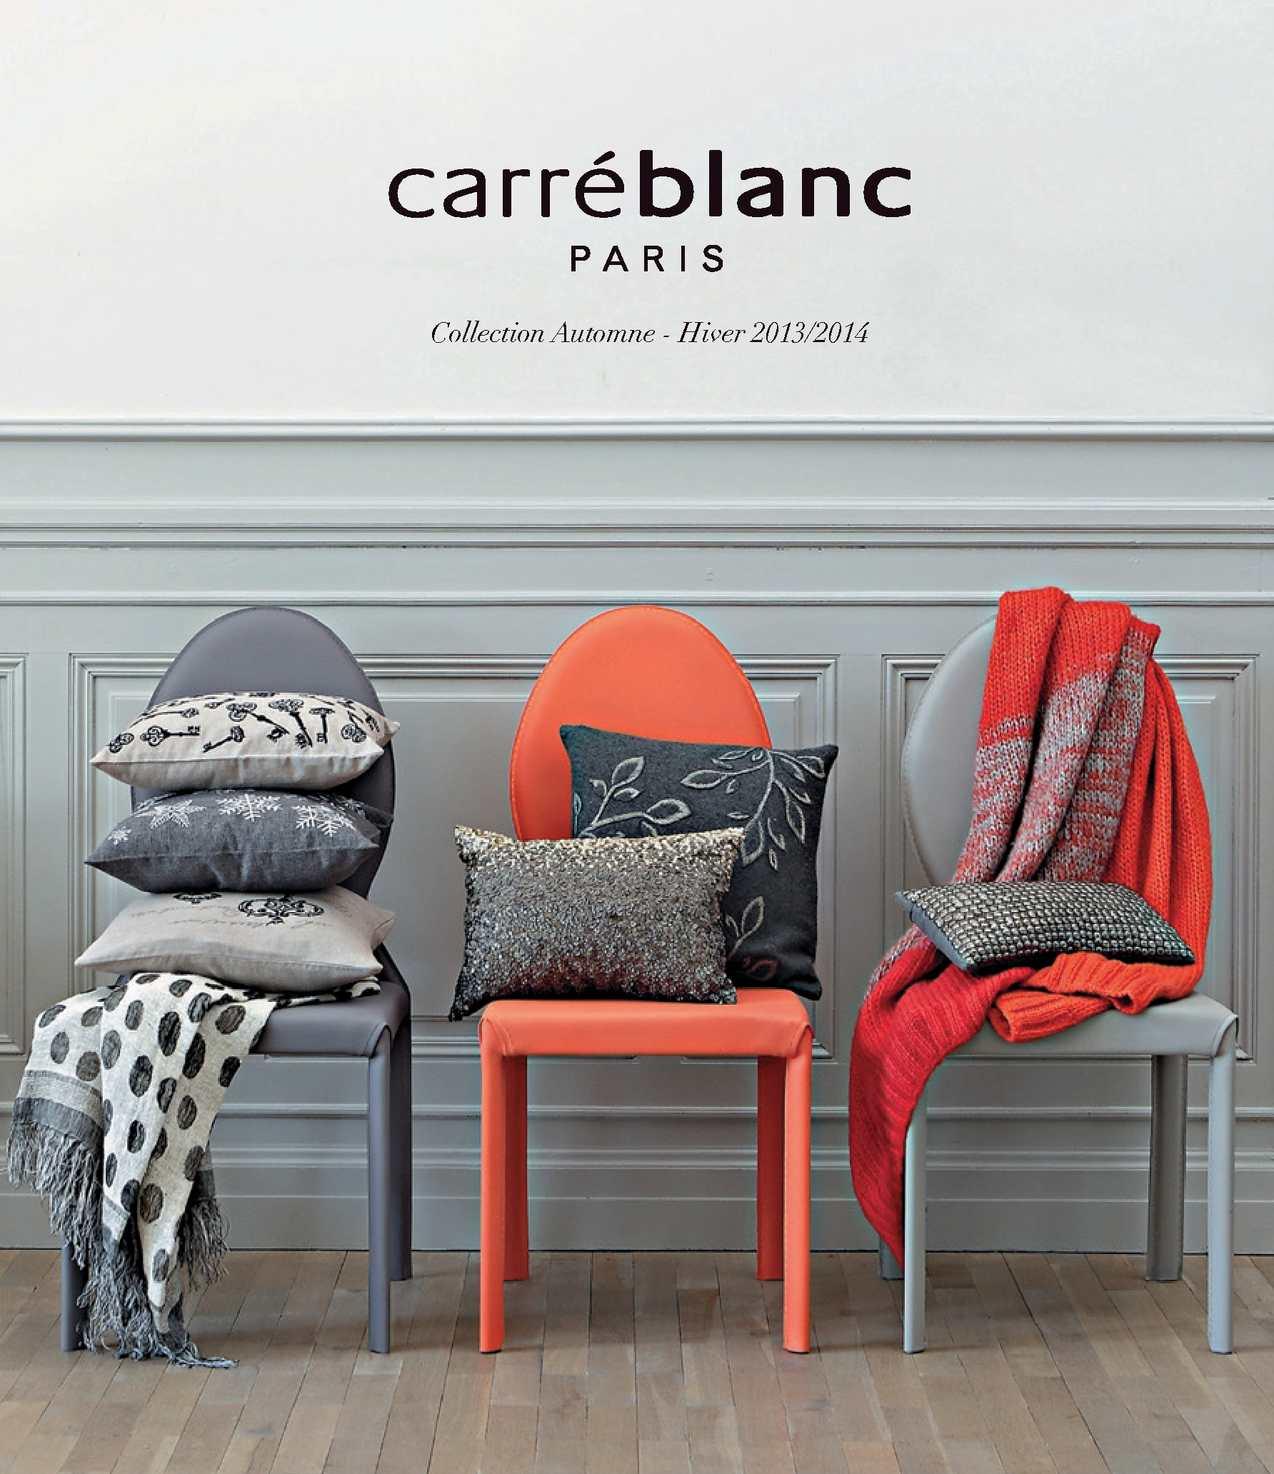 calam o collection automne hiver 2013 par carr blanc. Black Bedroom Furniture Sets. Home Design Ideas